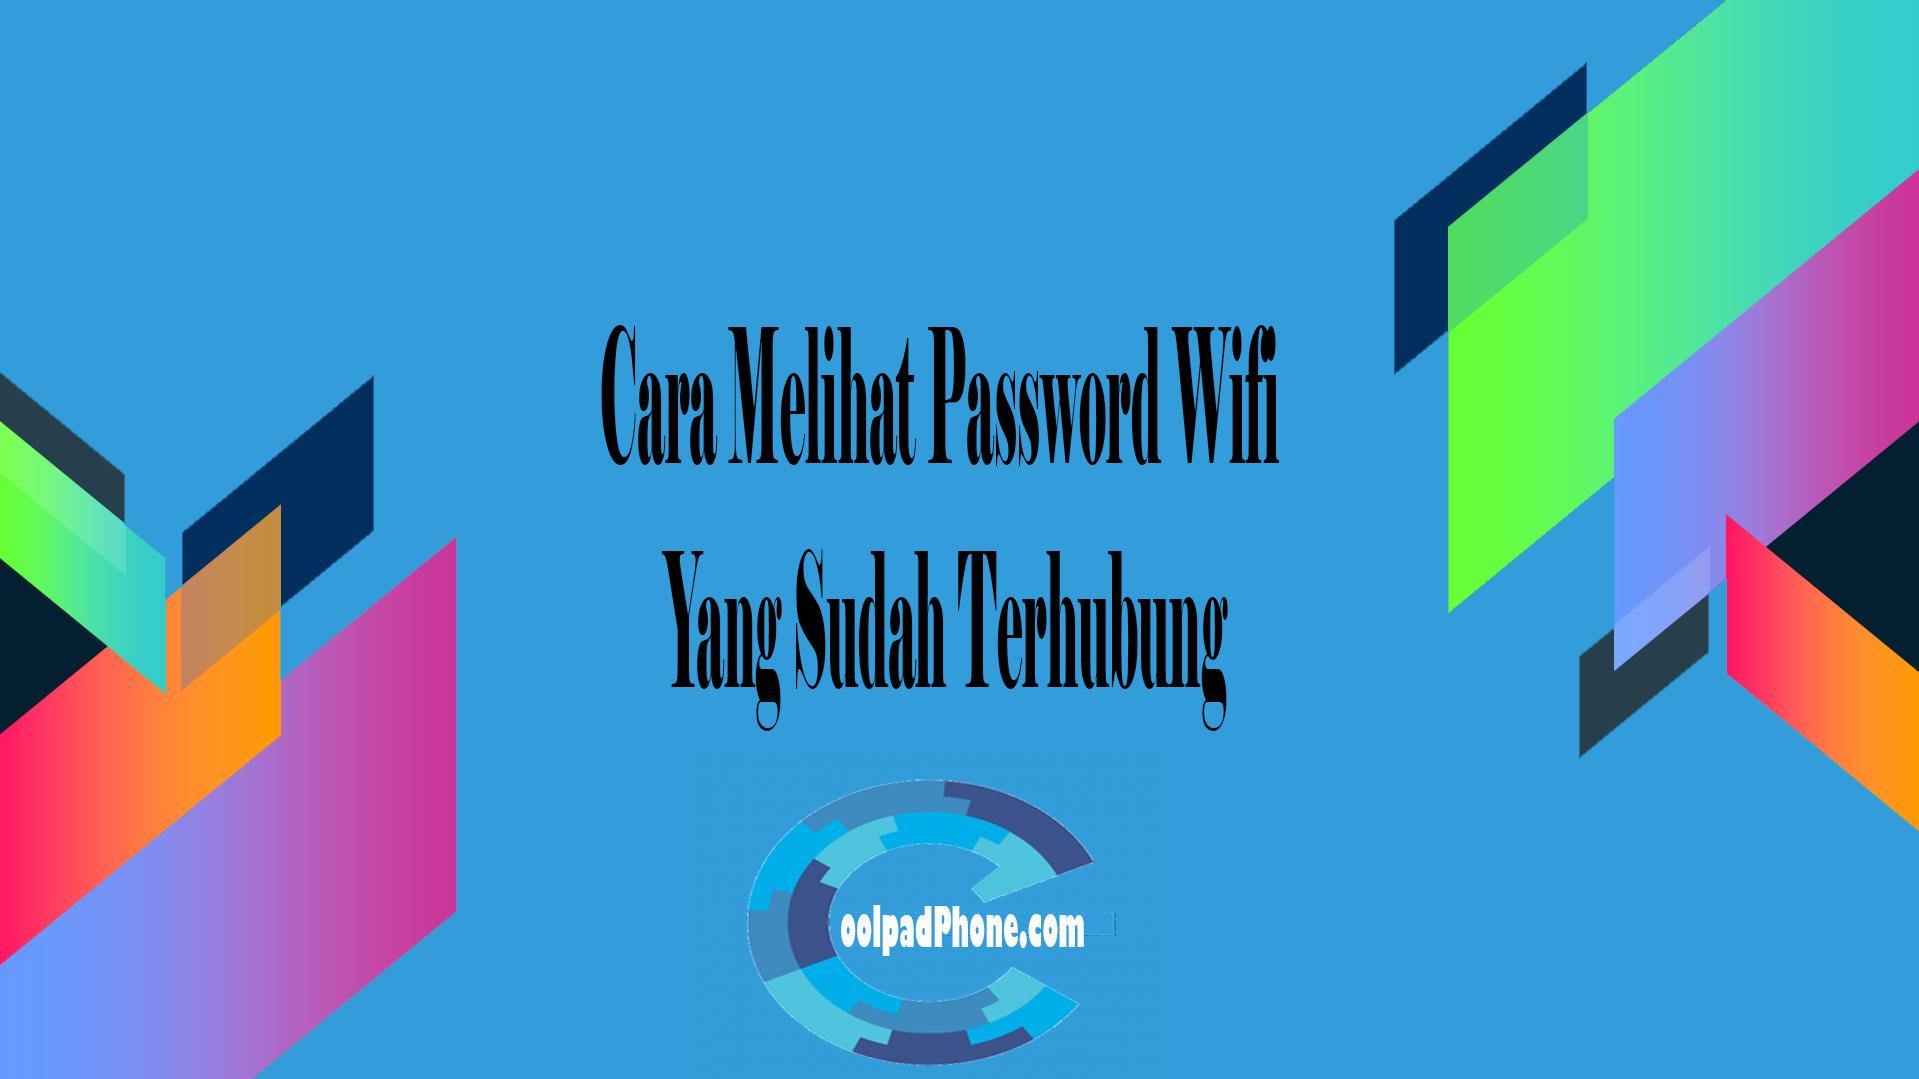 Cara Melihat Password Wifi Yang Sudah Terhubung